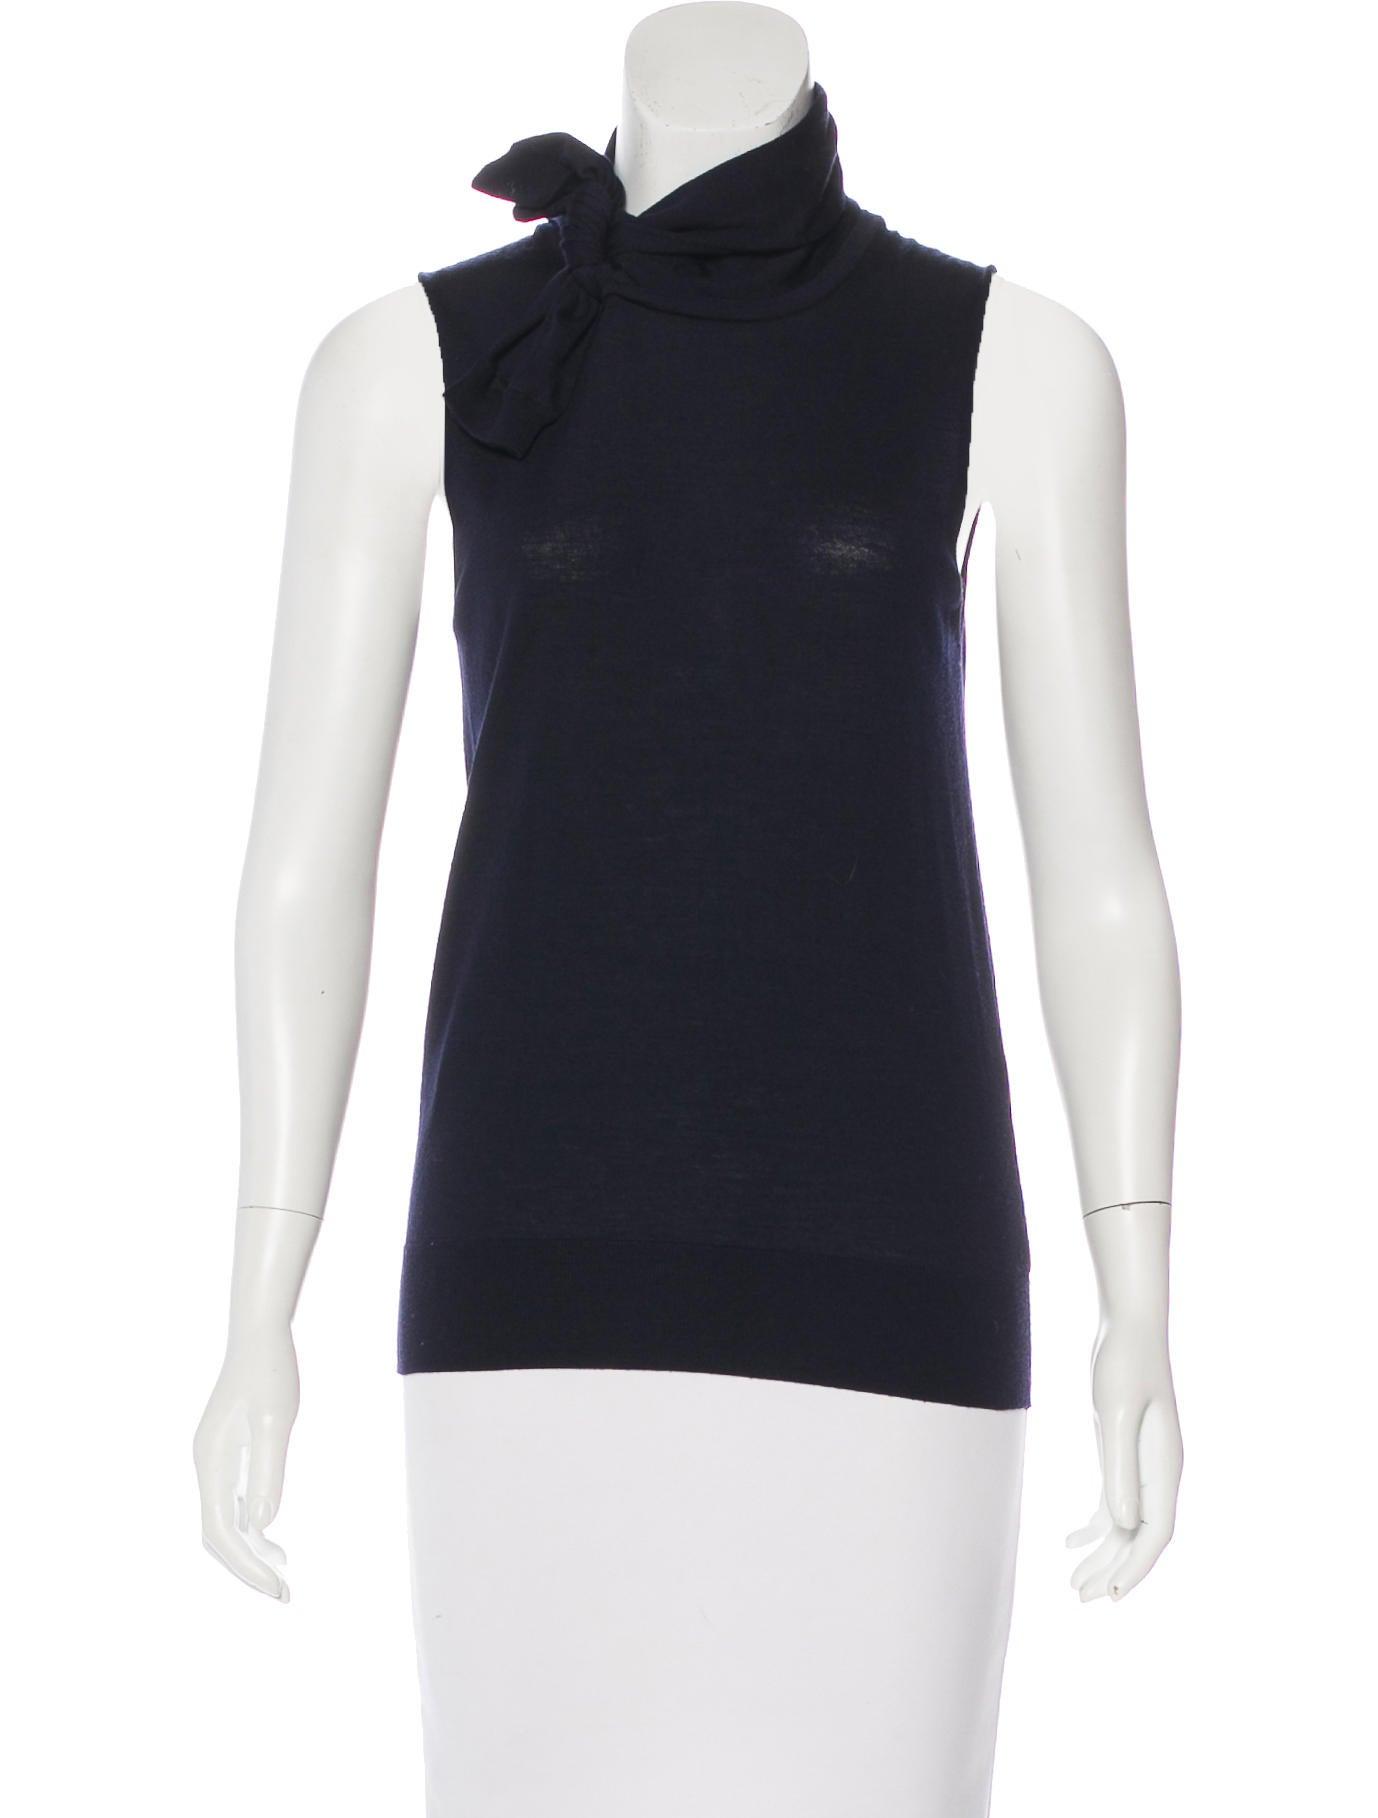 Prada wool sleeveless top clothing pra168716 the for Best wool shirt jackets